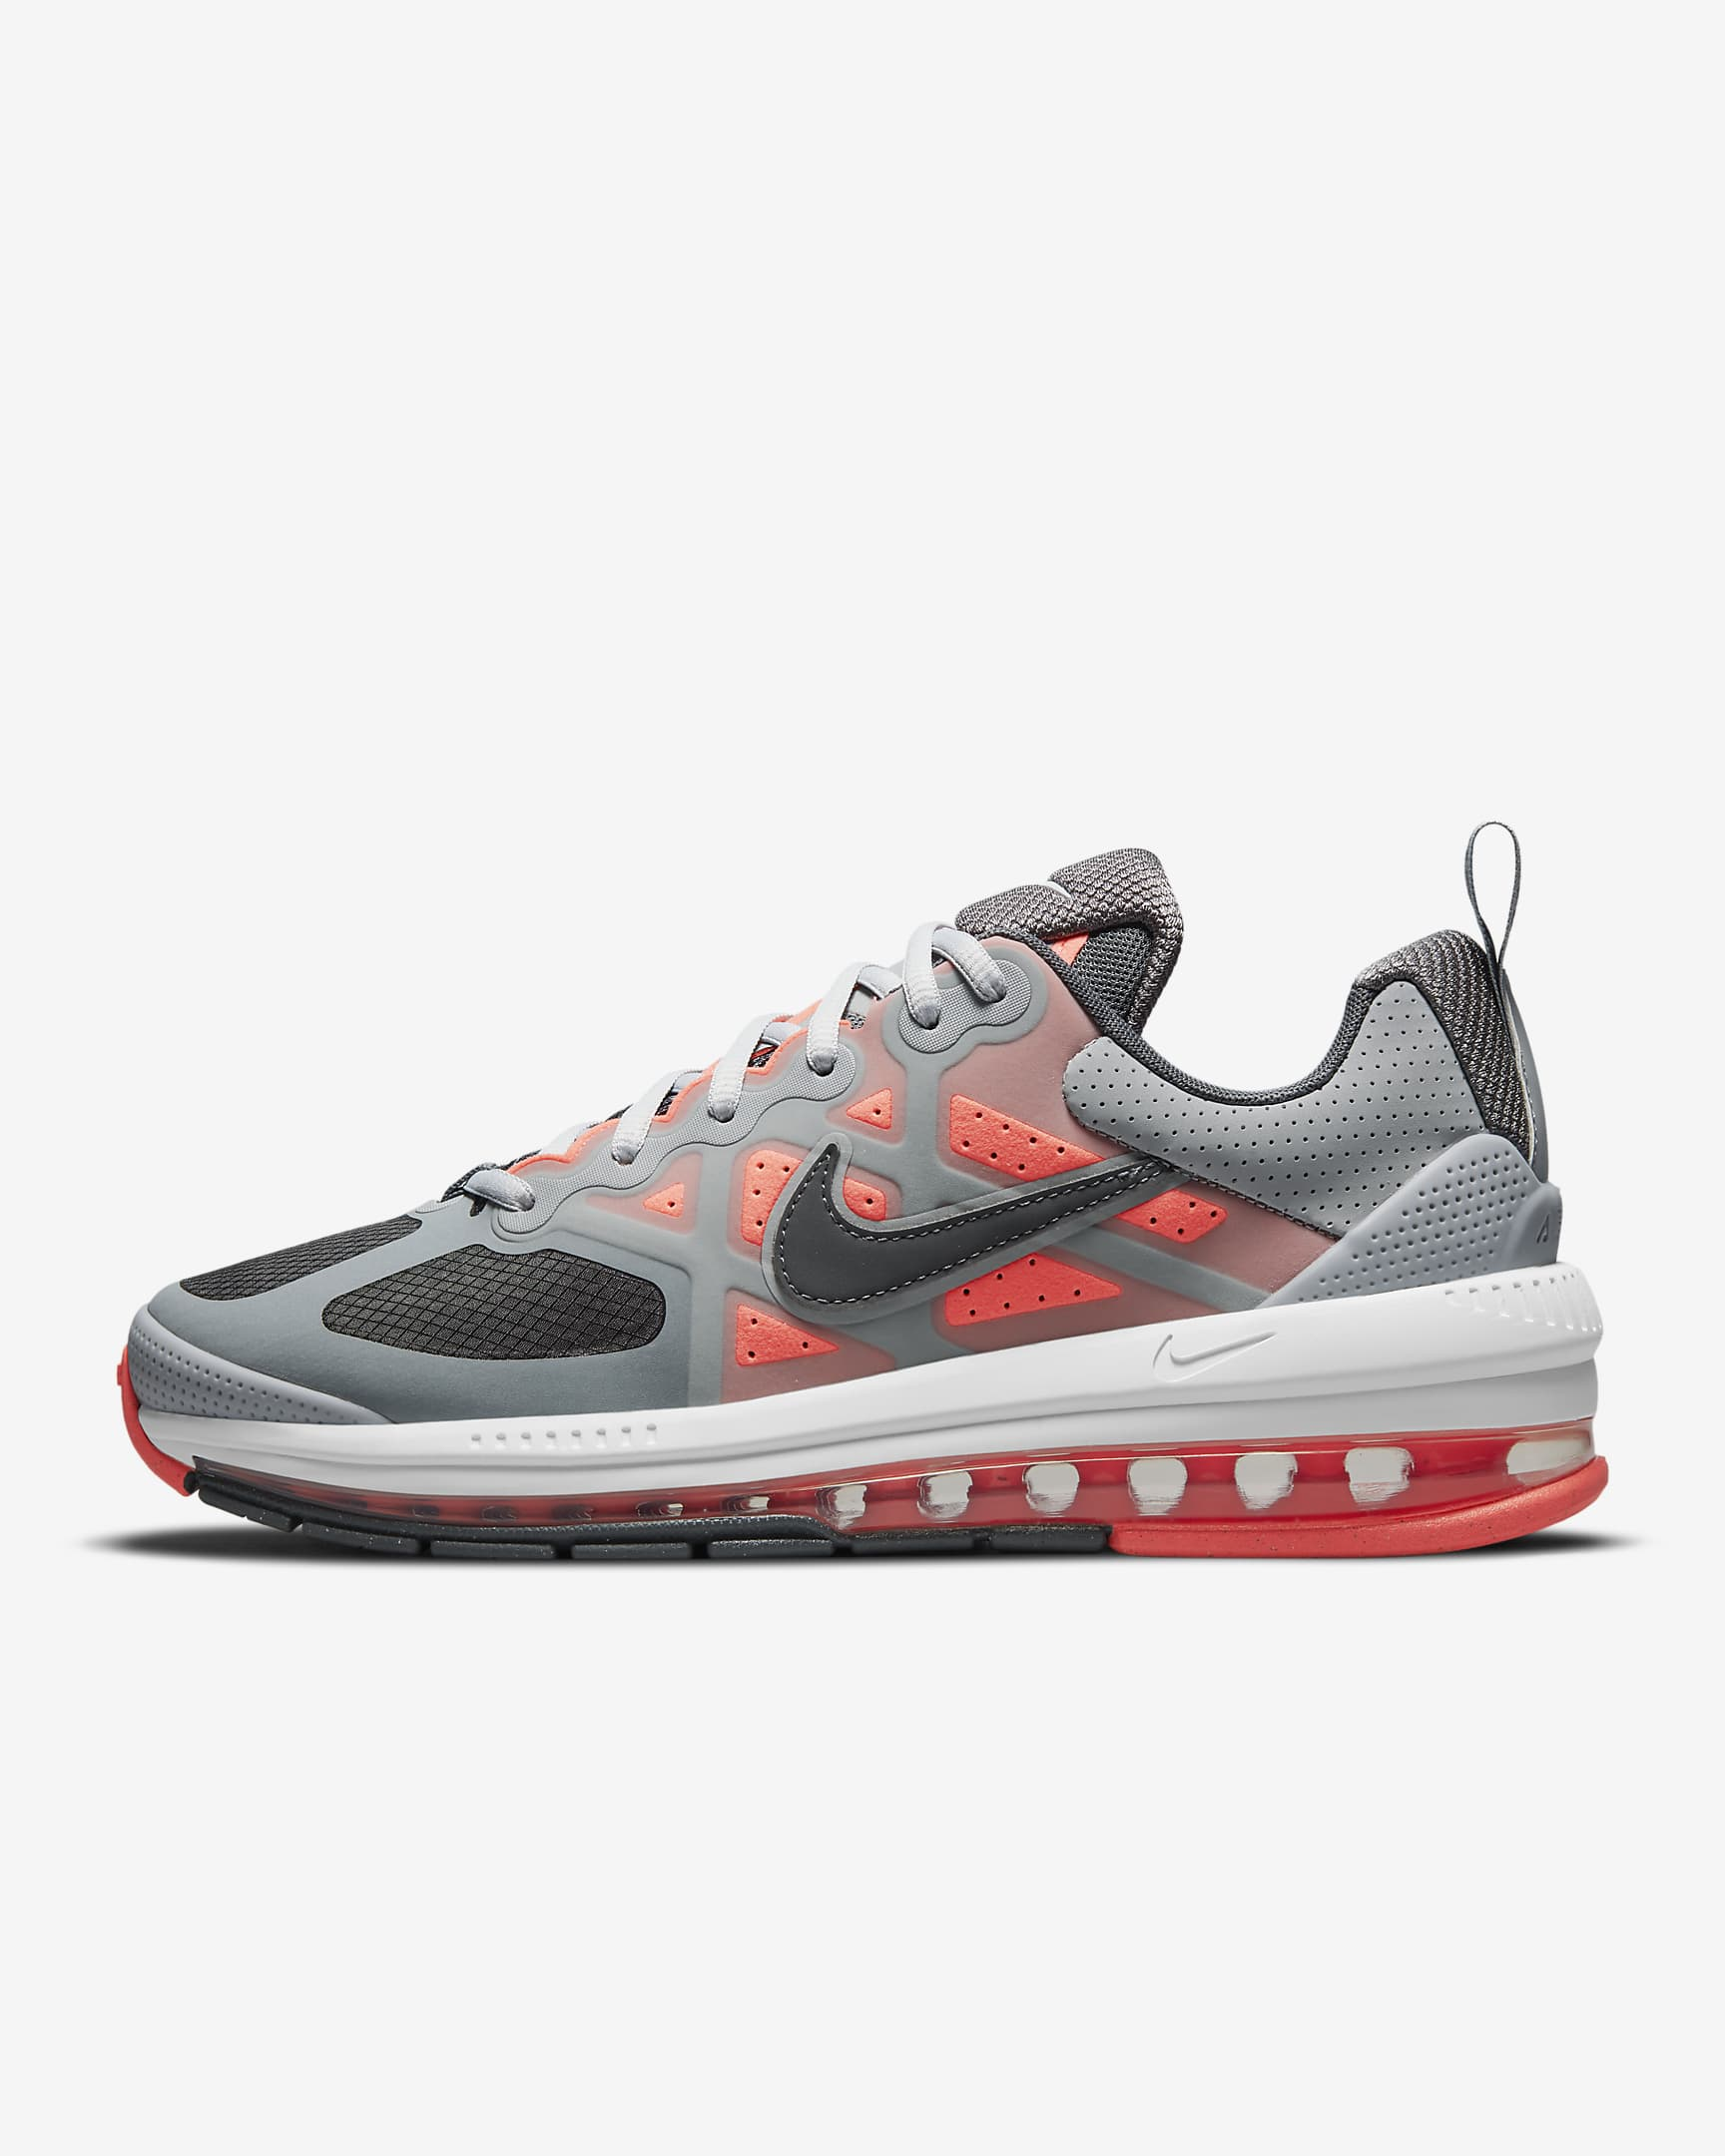 Nike Air Max Genome Men's Shoes $85